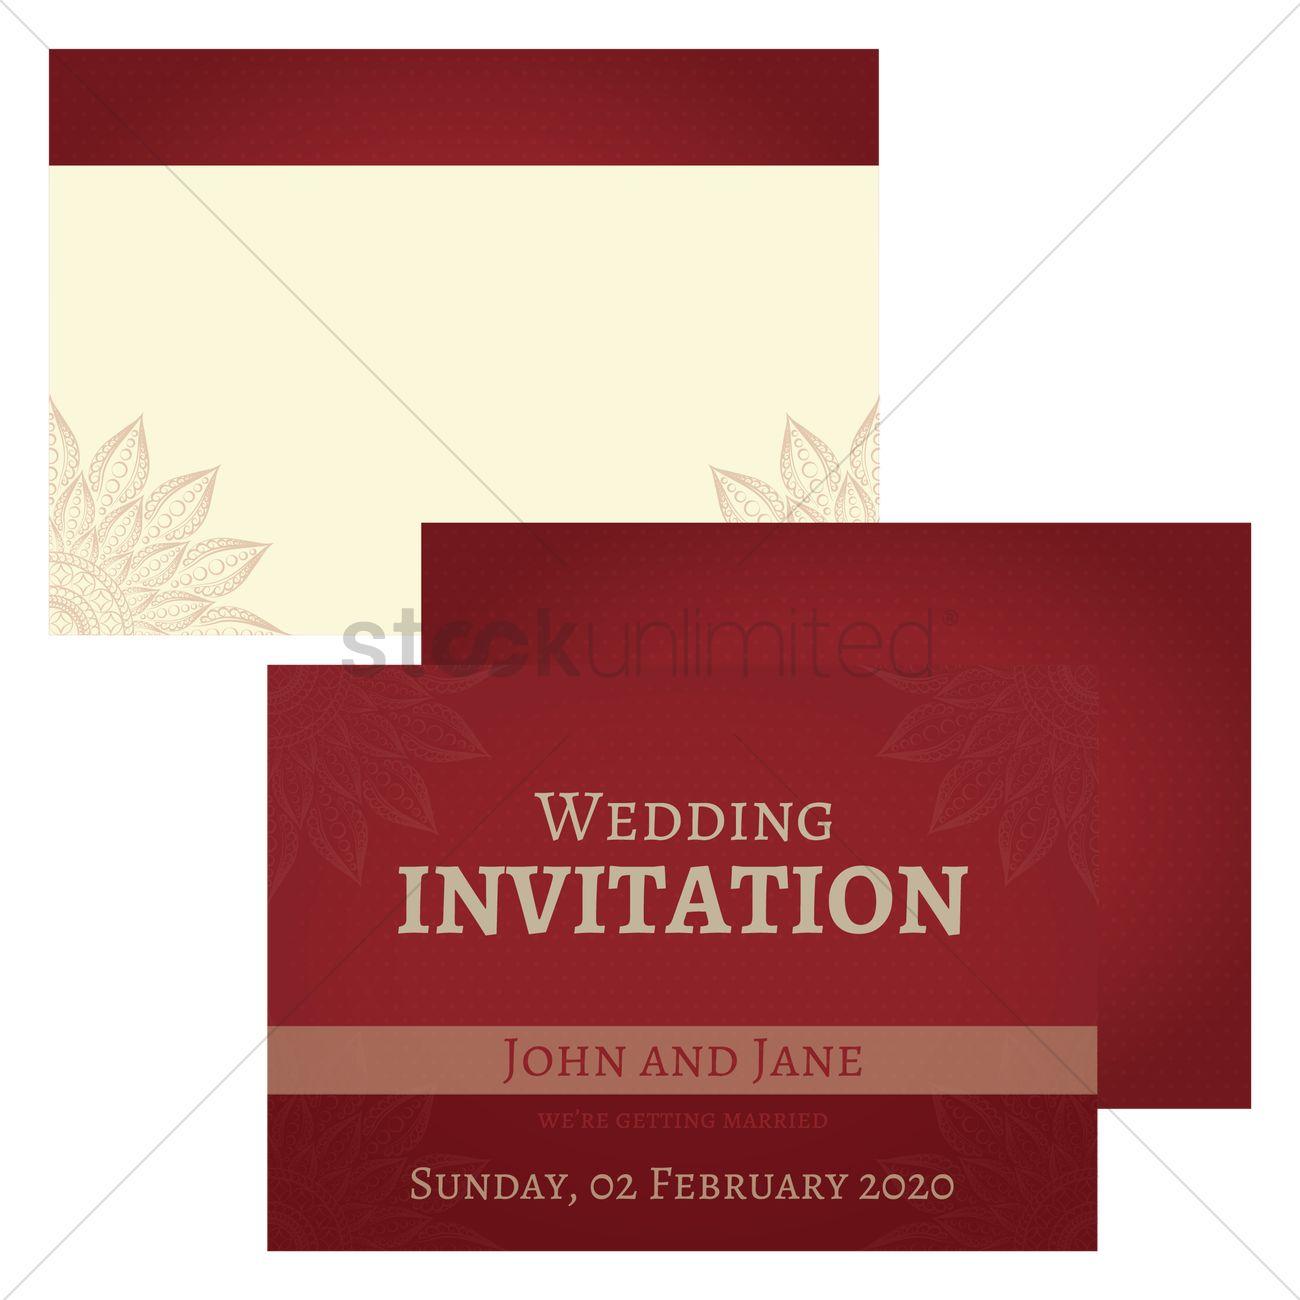 Wedding invitation design Vector Image - 1975938 | StockUnlimited